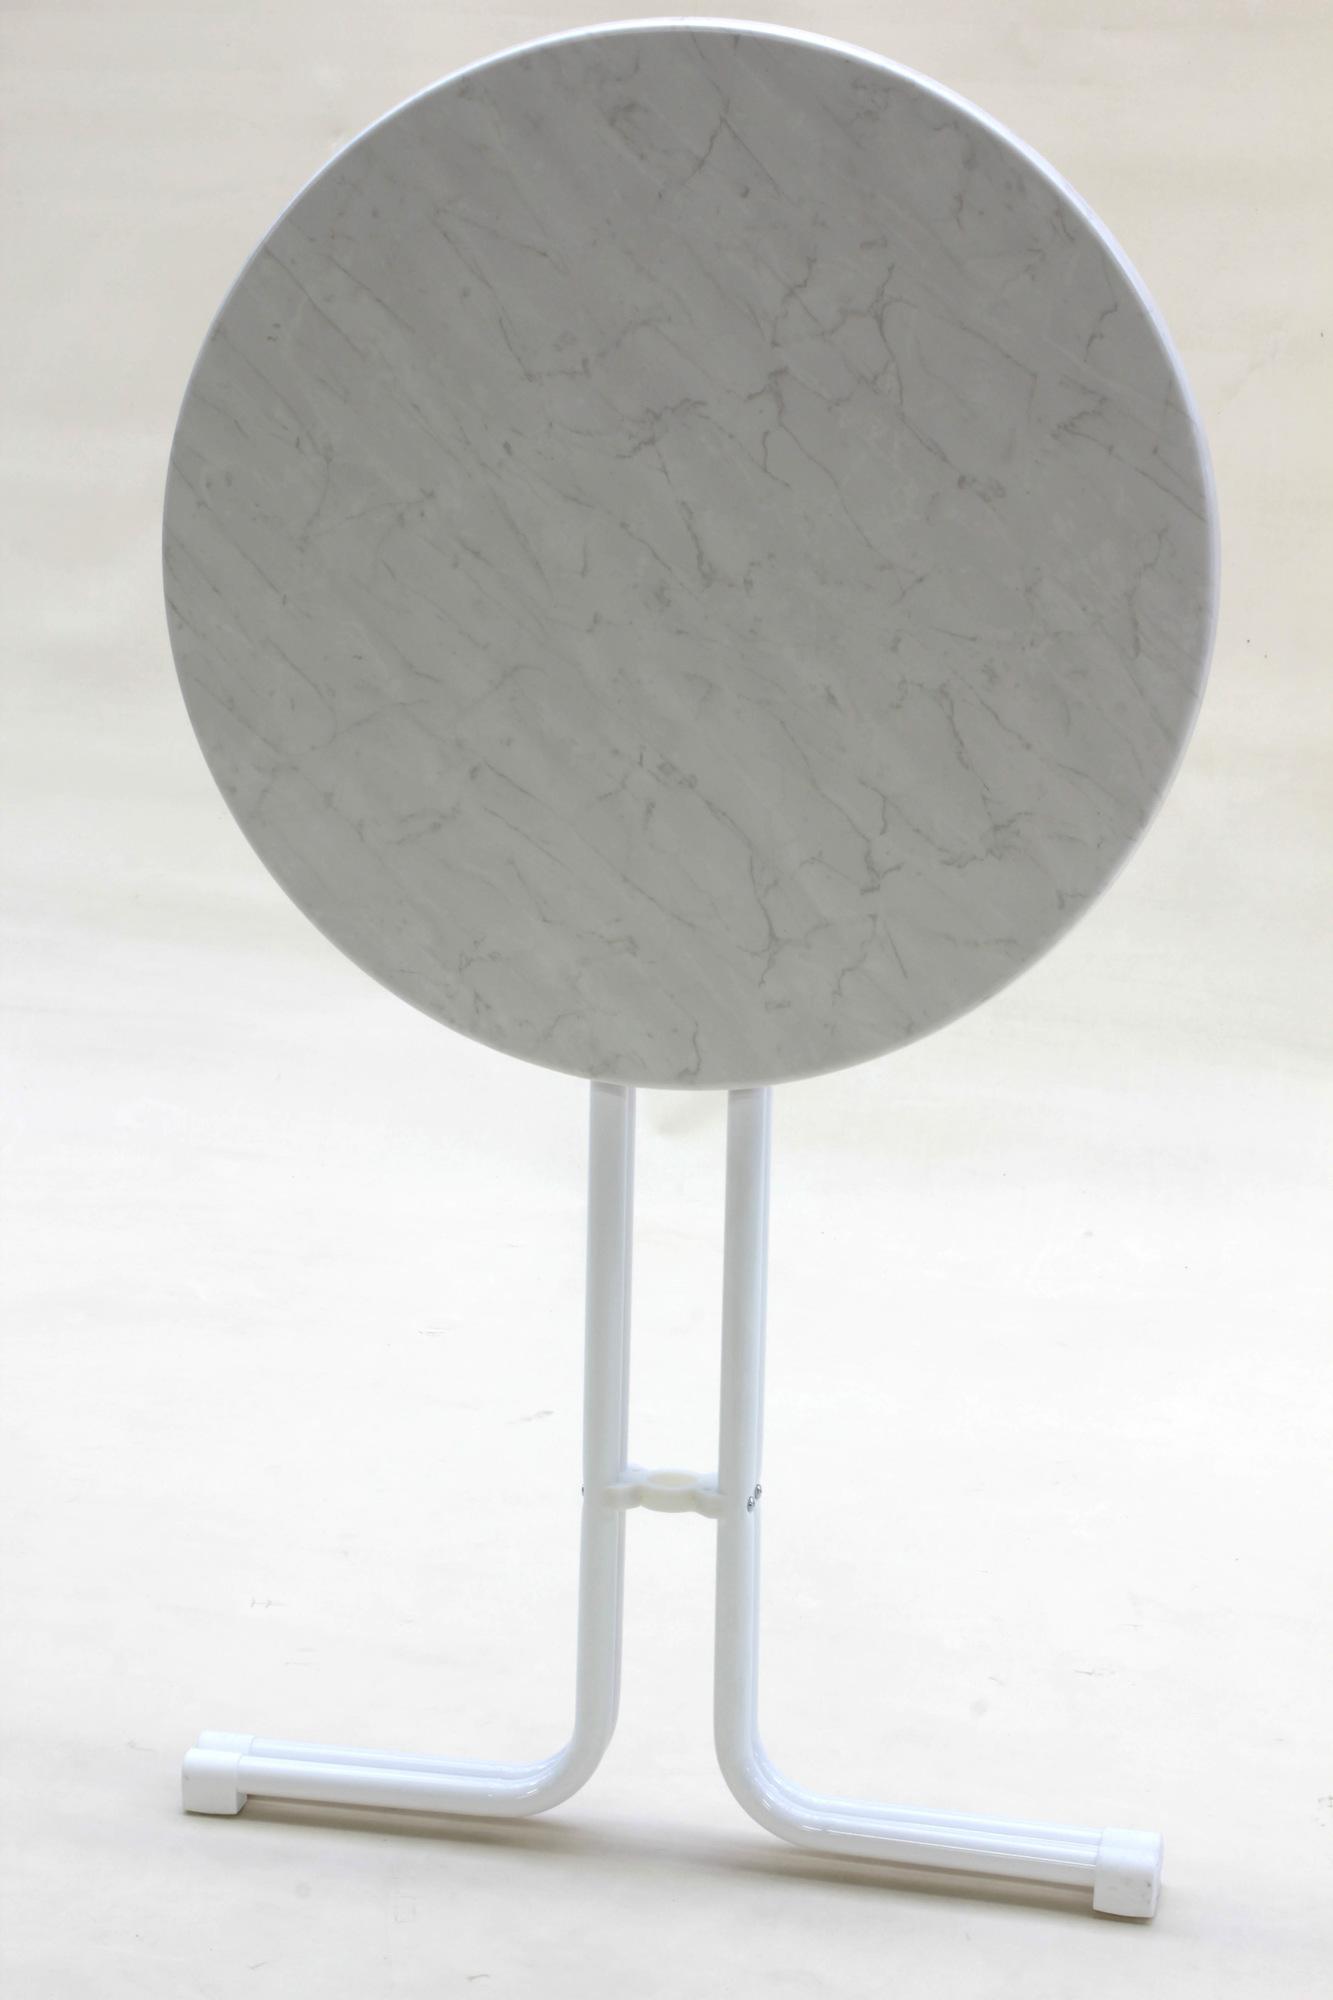 1539259073-gartenmoebel-80cm-stehtisch-topalit_0.jpg